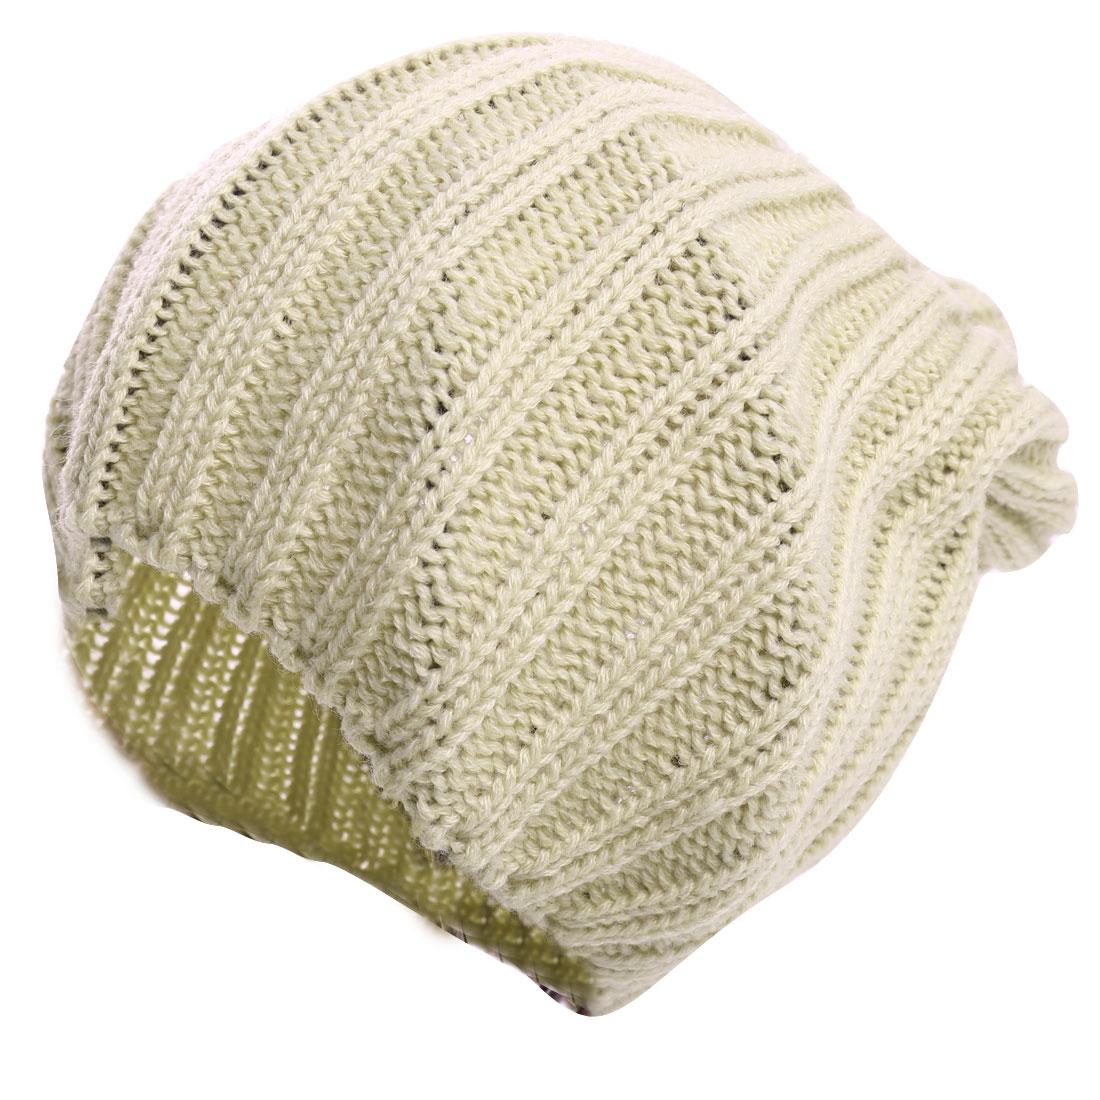 Unisex Beige Fashion Solid Color Textured Design Warm Knitting Beanie Cap